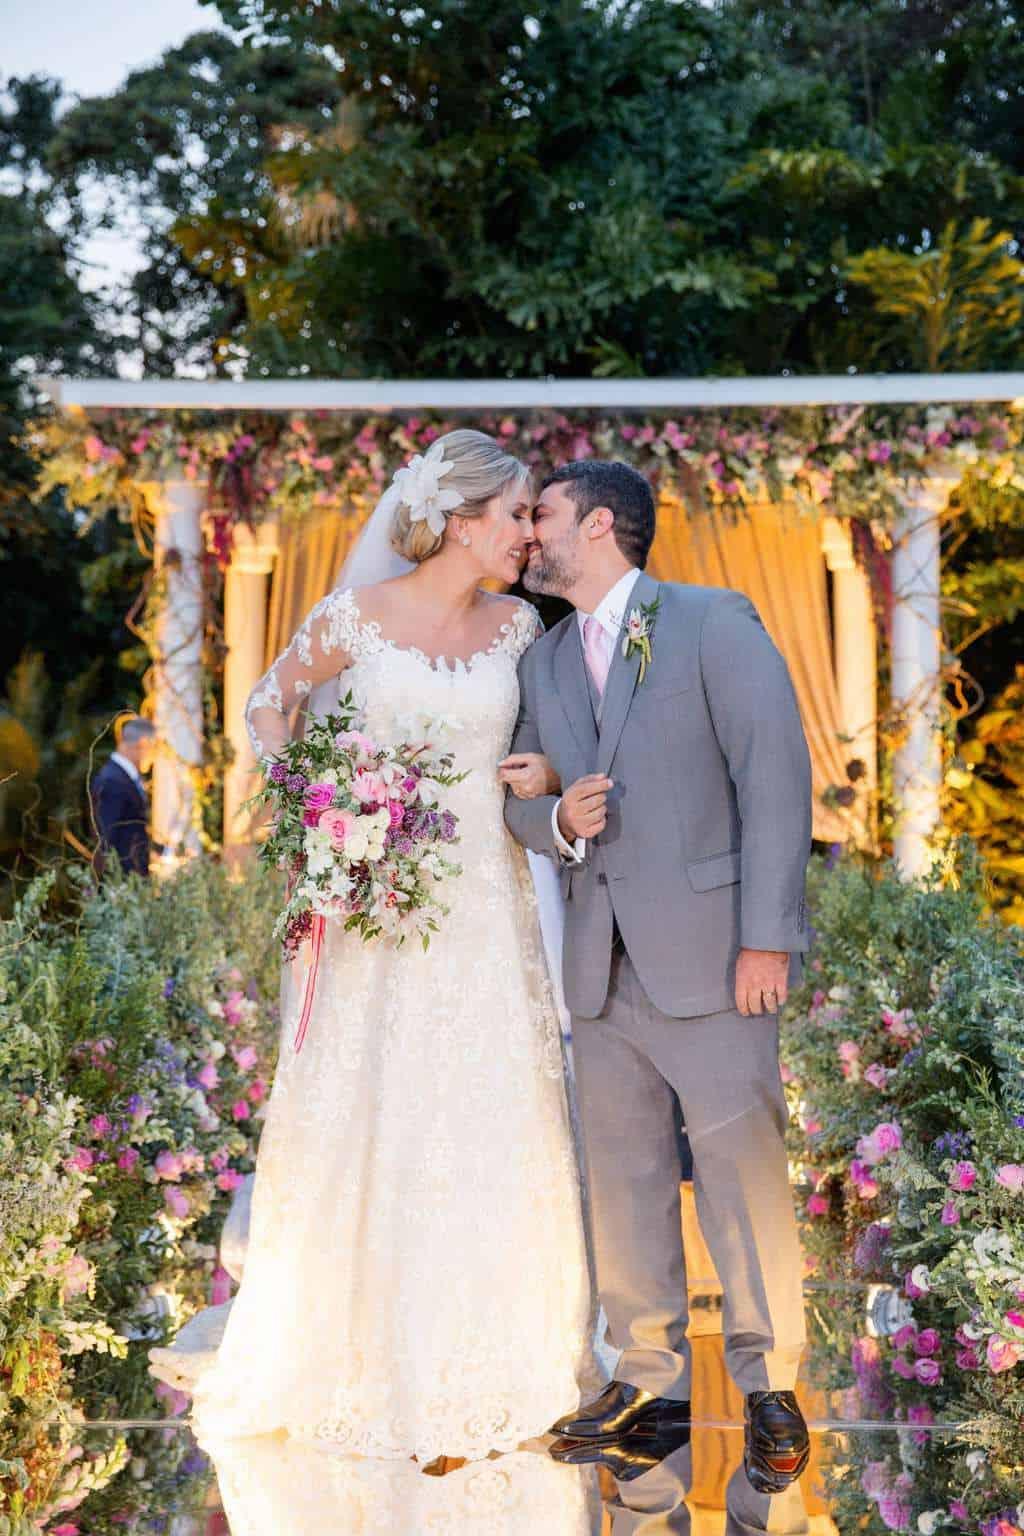 Andrea-Kapps-casamento-de-dia-casamento-na-serra-casamento-romântico-casamento-tradicional-cerimônia-Locanda-de-La-Mimosa-rosa-e-lilás-casamento-33